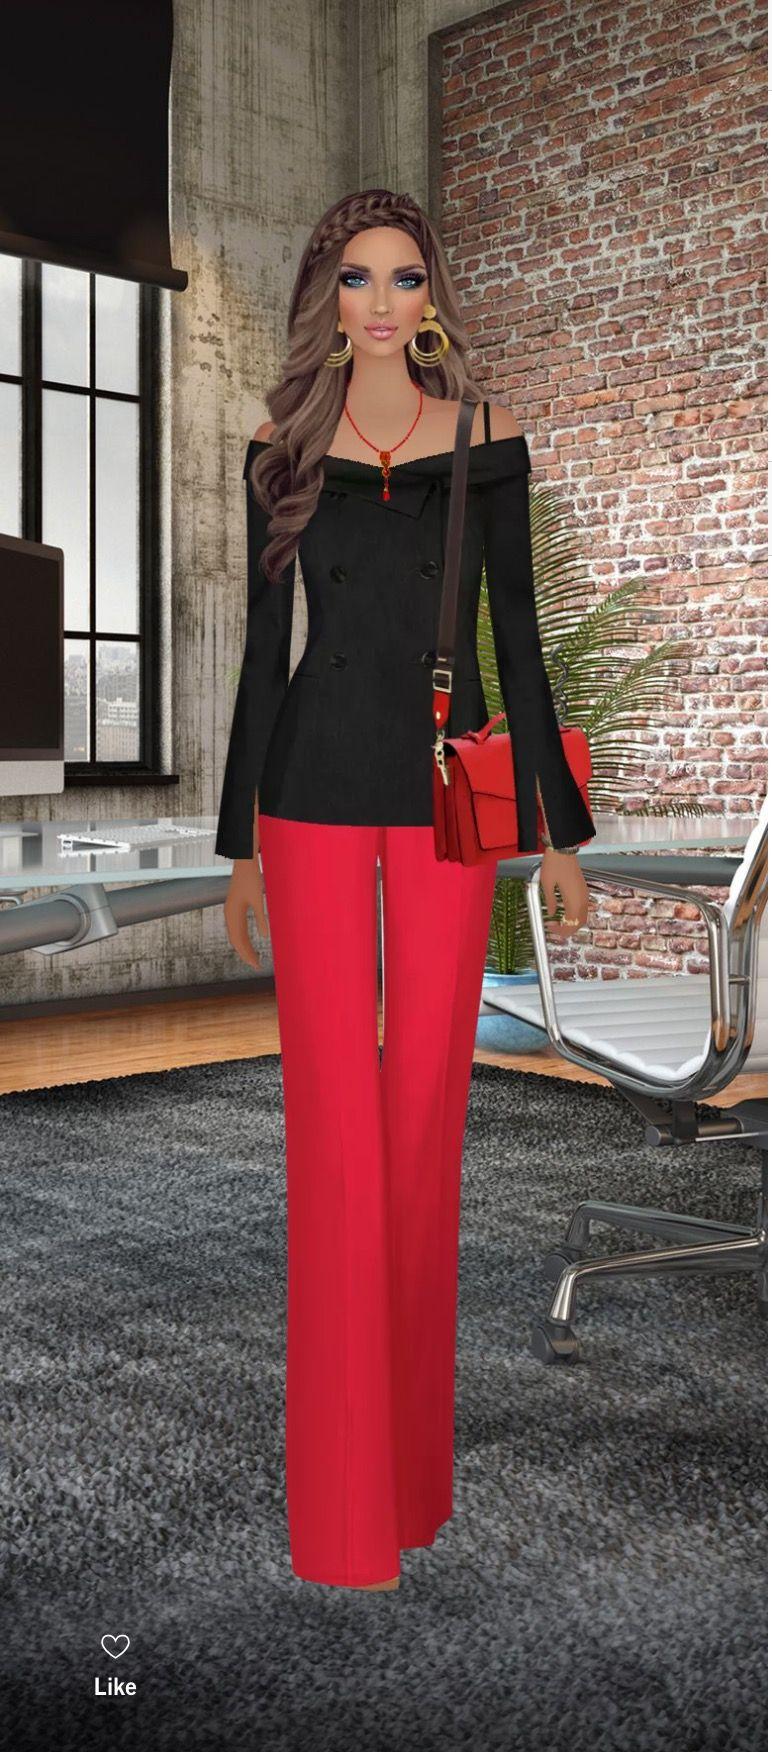 e974a771a Moda Para Mujer · Vestidos Casuales Elegantes